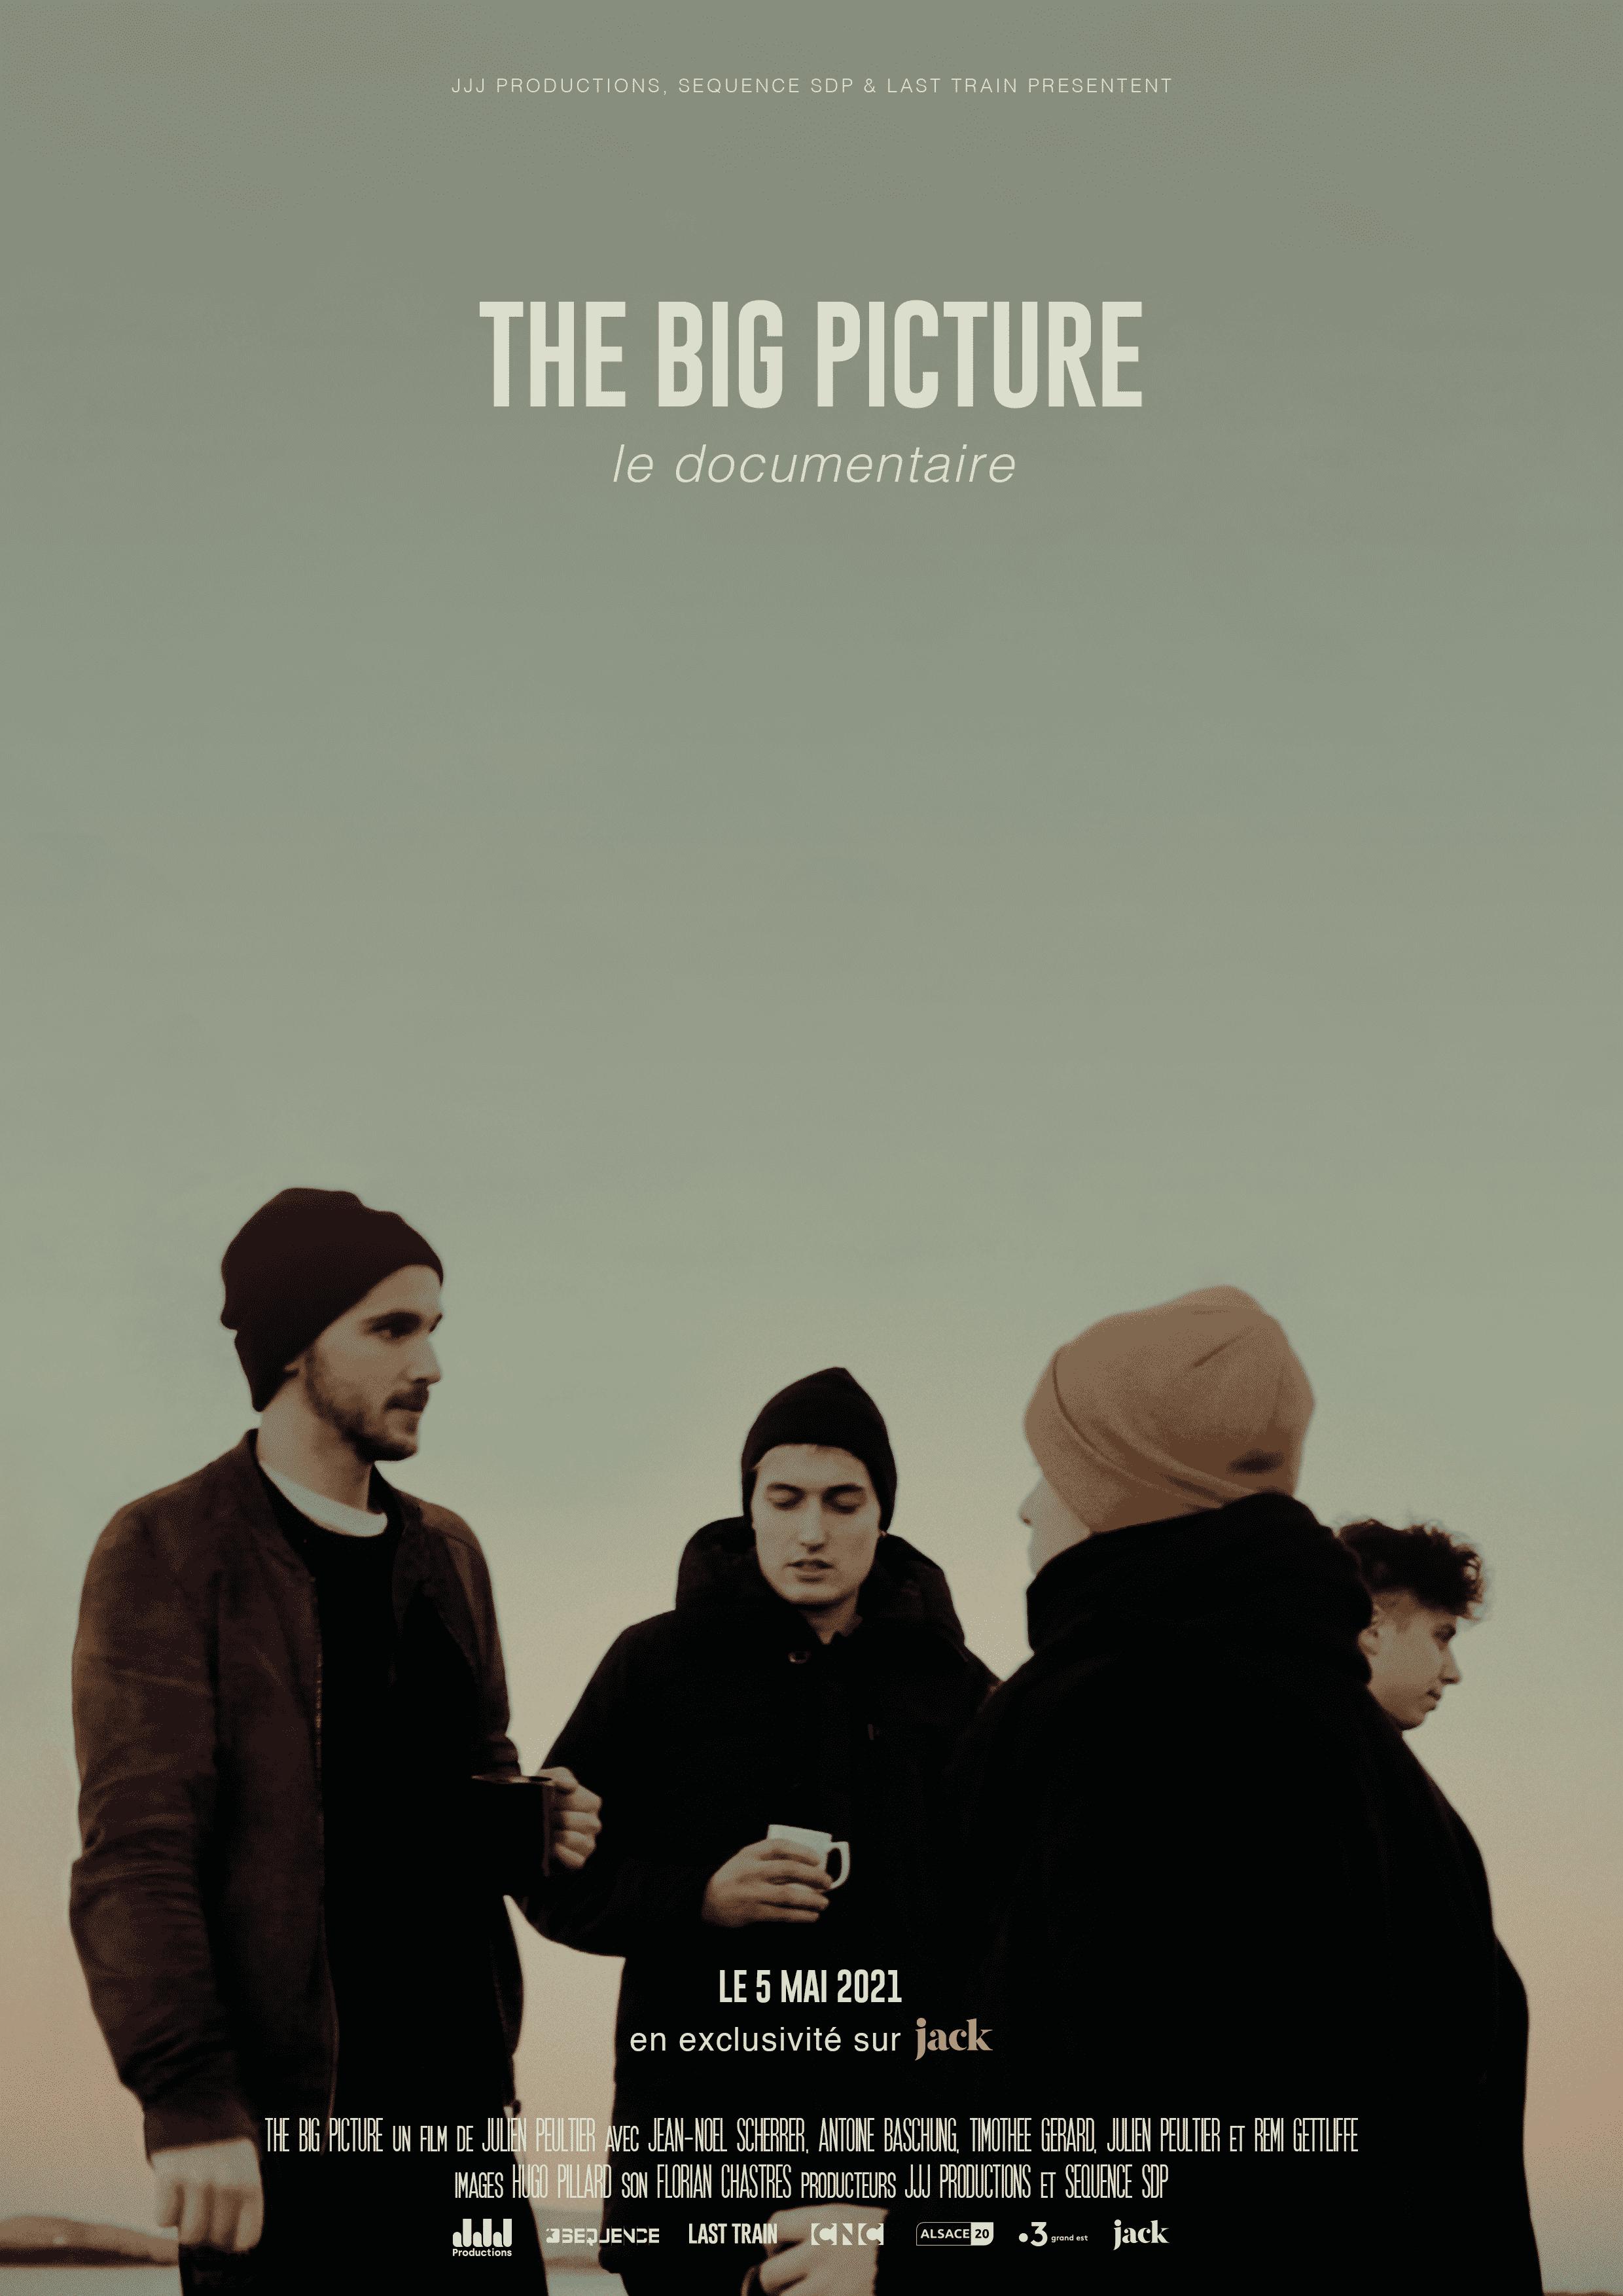 Last Train - The Big Picture documentaire